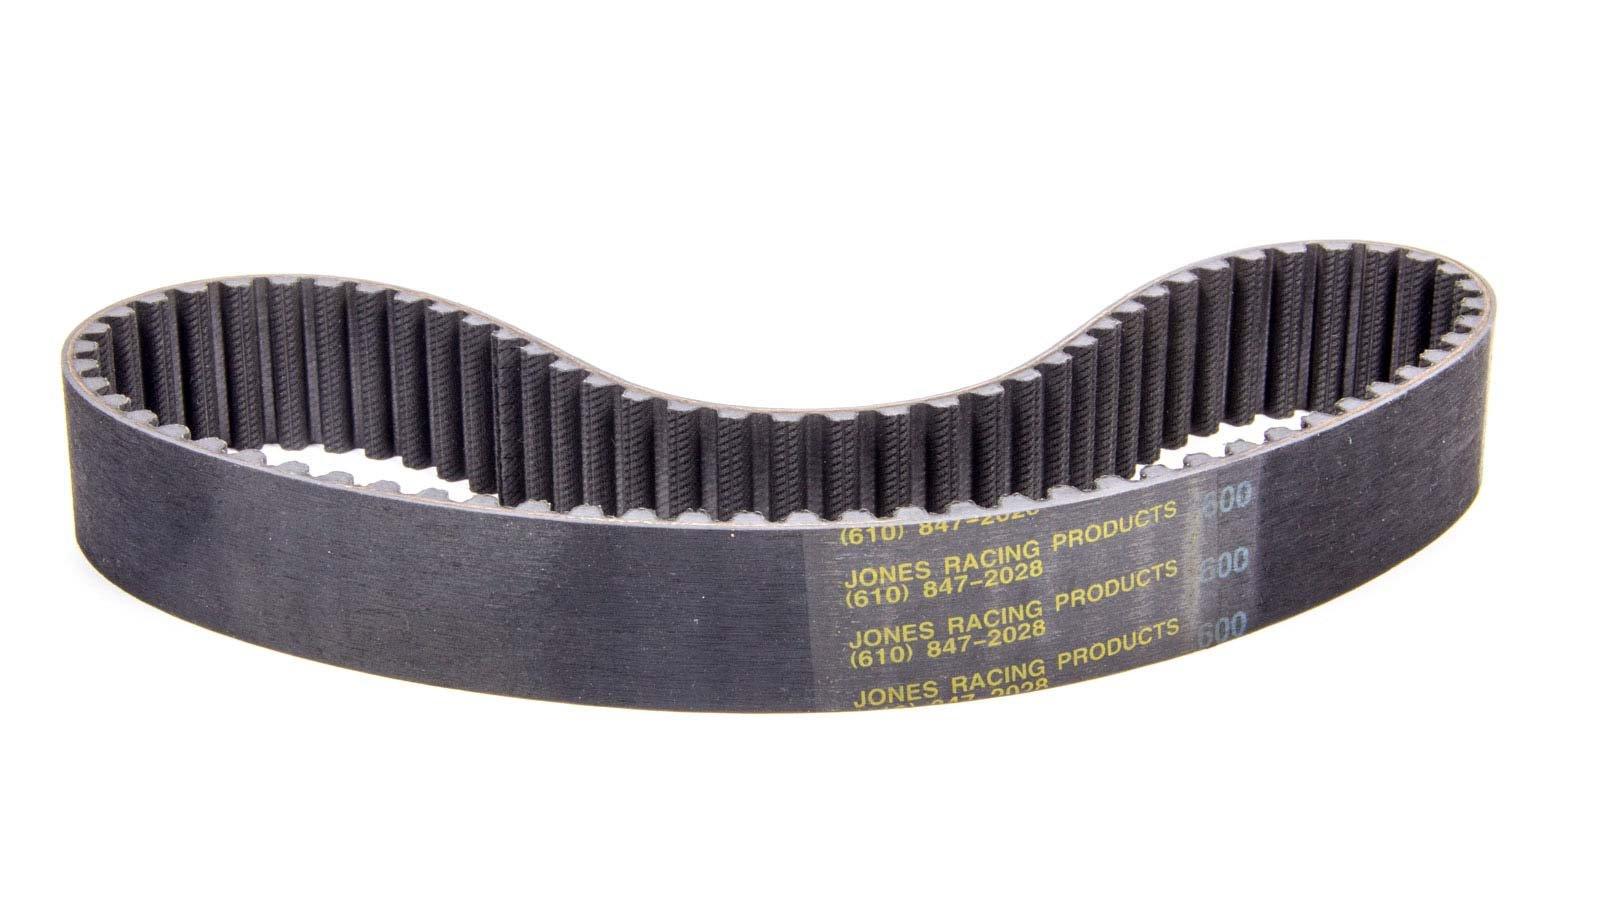 Jones Racing Products 632-30HD HTD Belt by Jones Racing Products (Image #1)